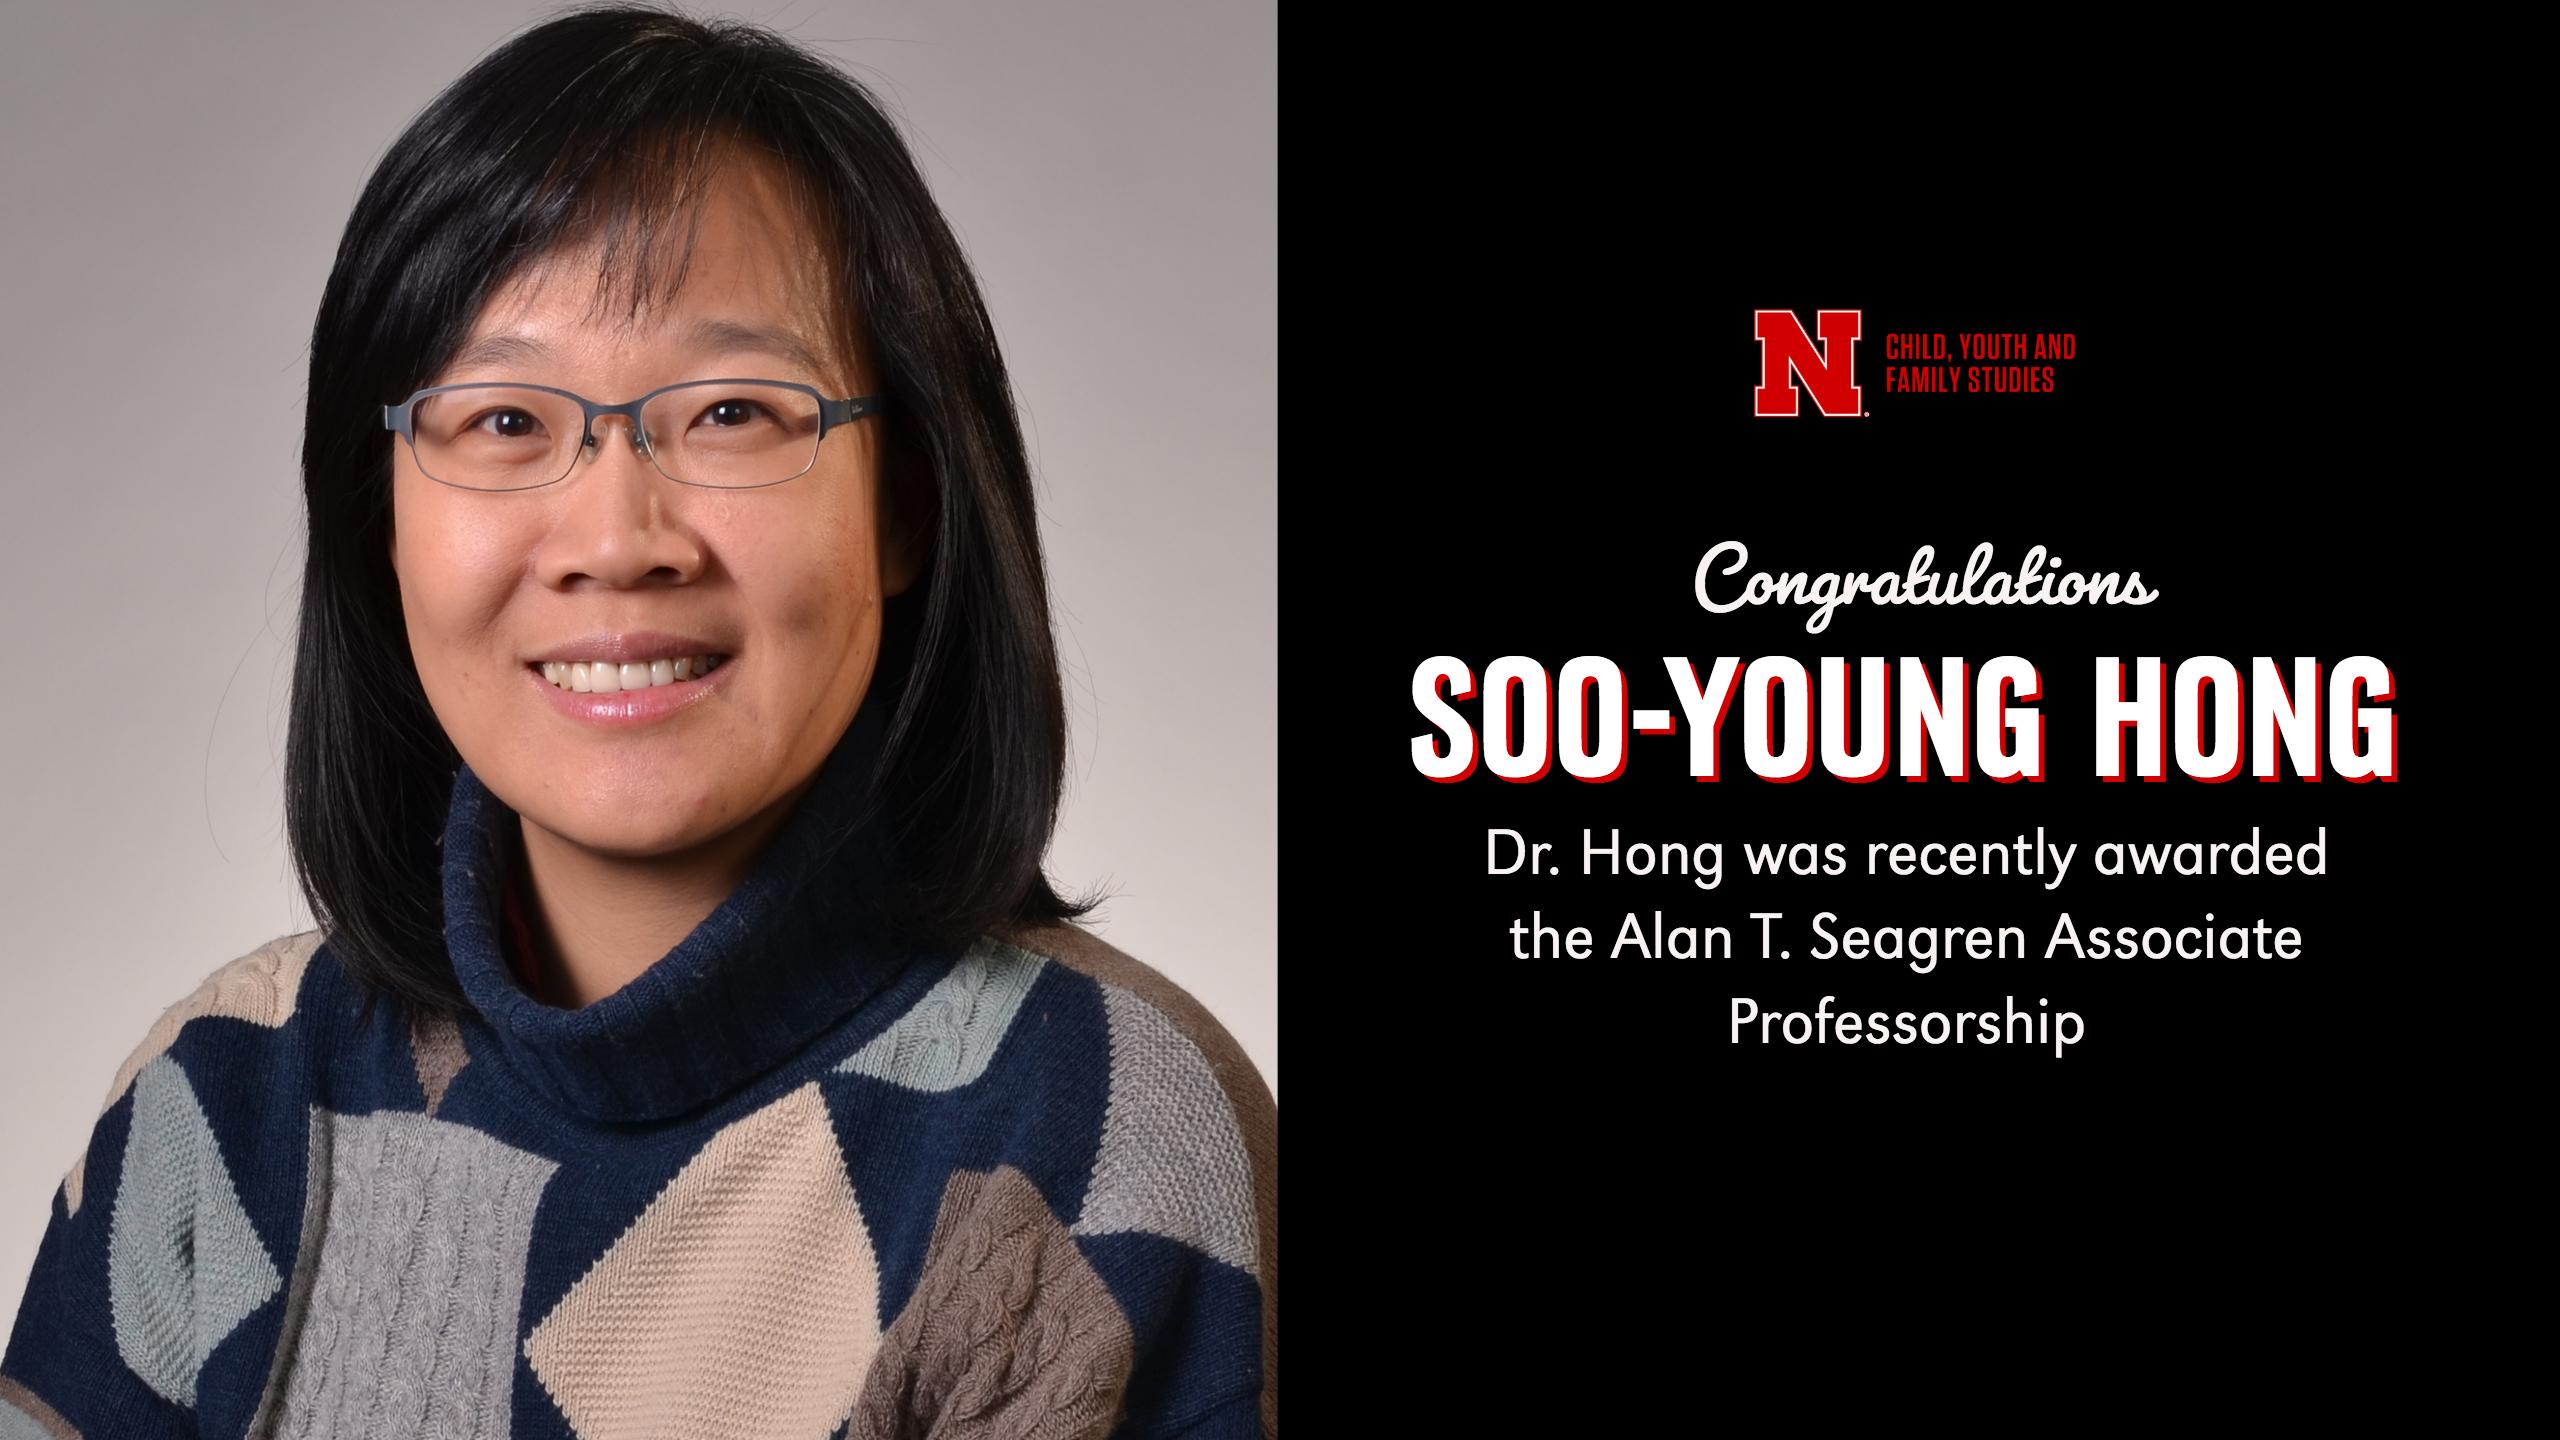 Soo-Young Hong awarded Alan T. Seagren Associate Professorship at University of Nebraska